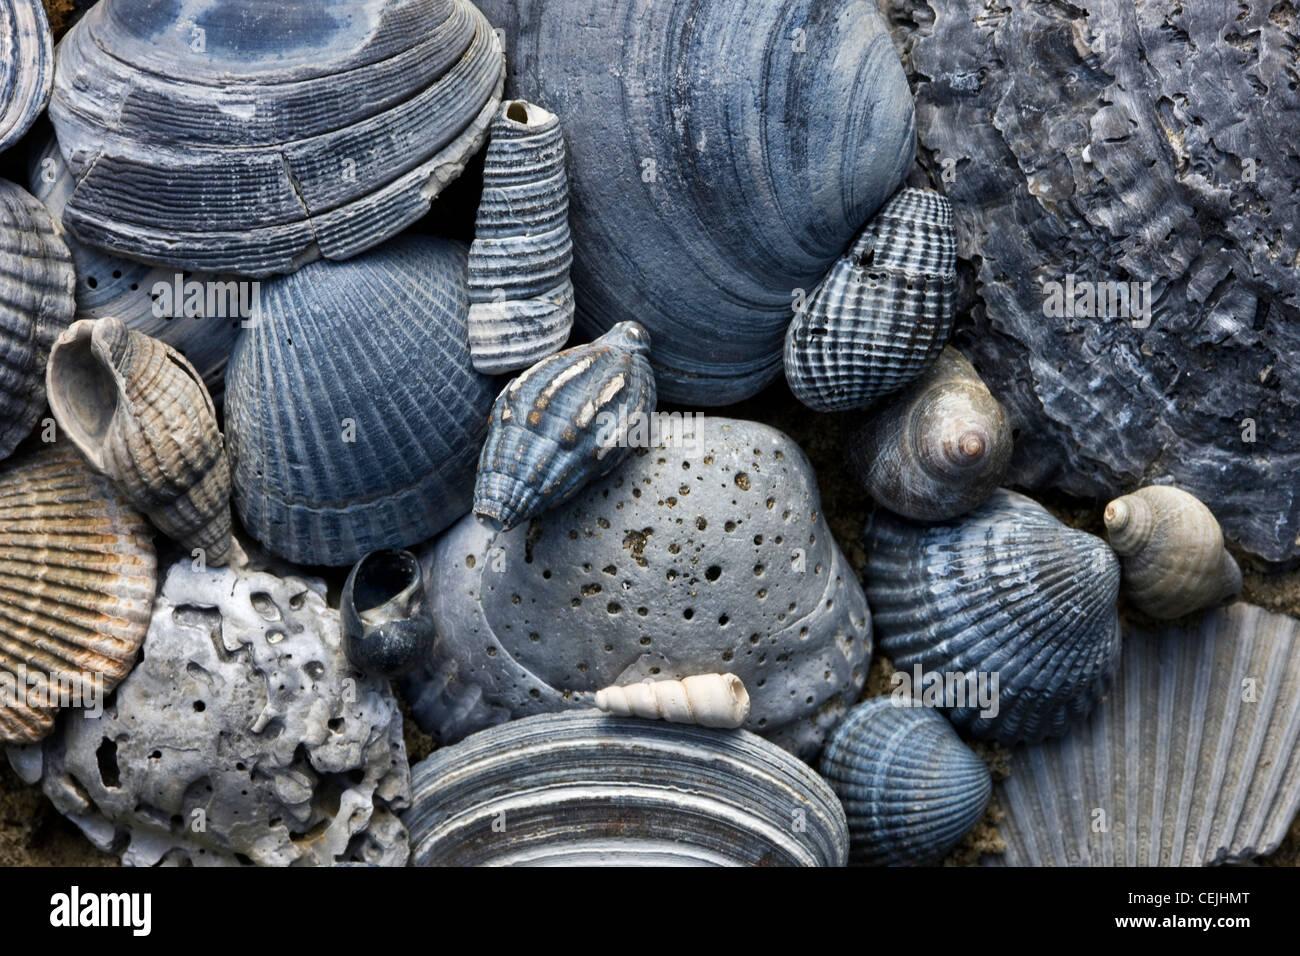 Fossilized Shells Stock Photos & Fossilized Shells Stock Images - Alamy